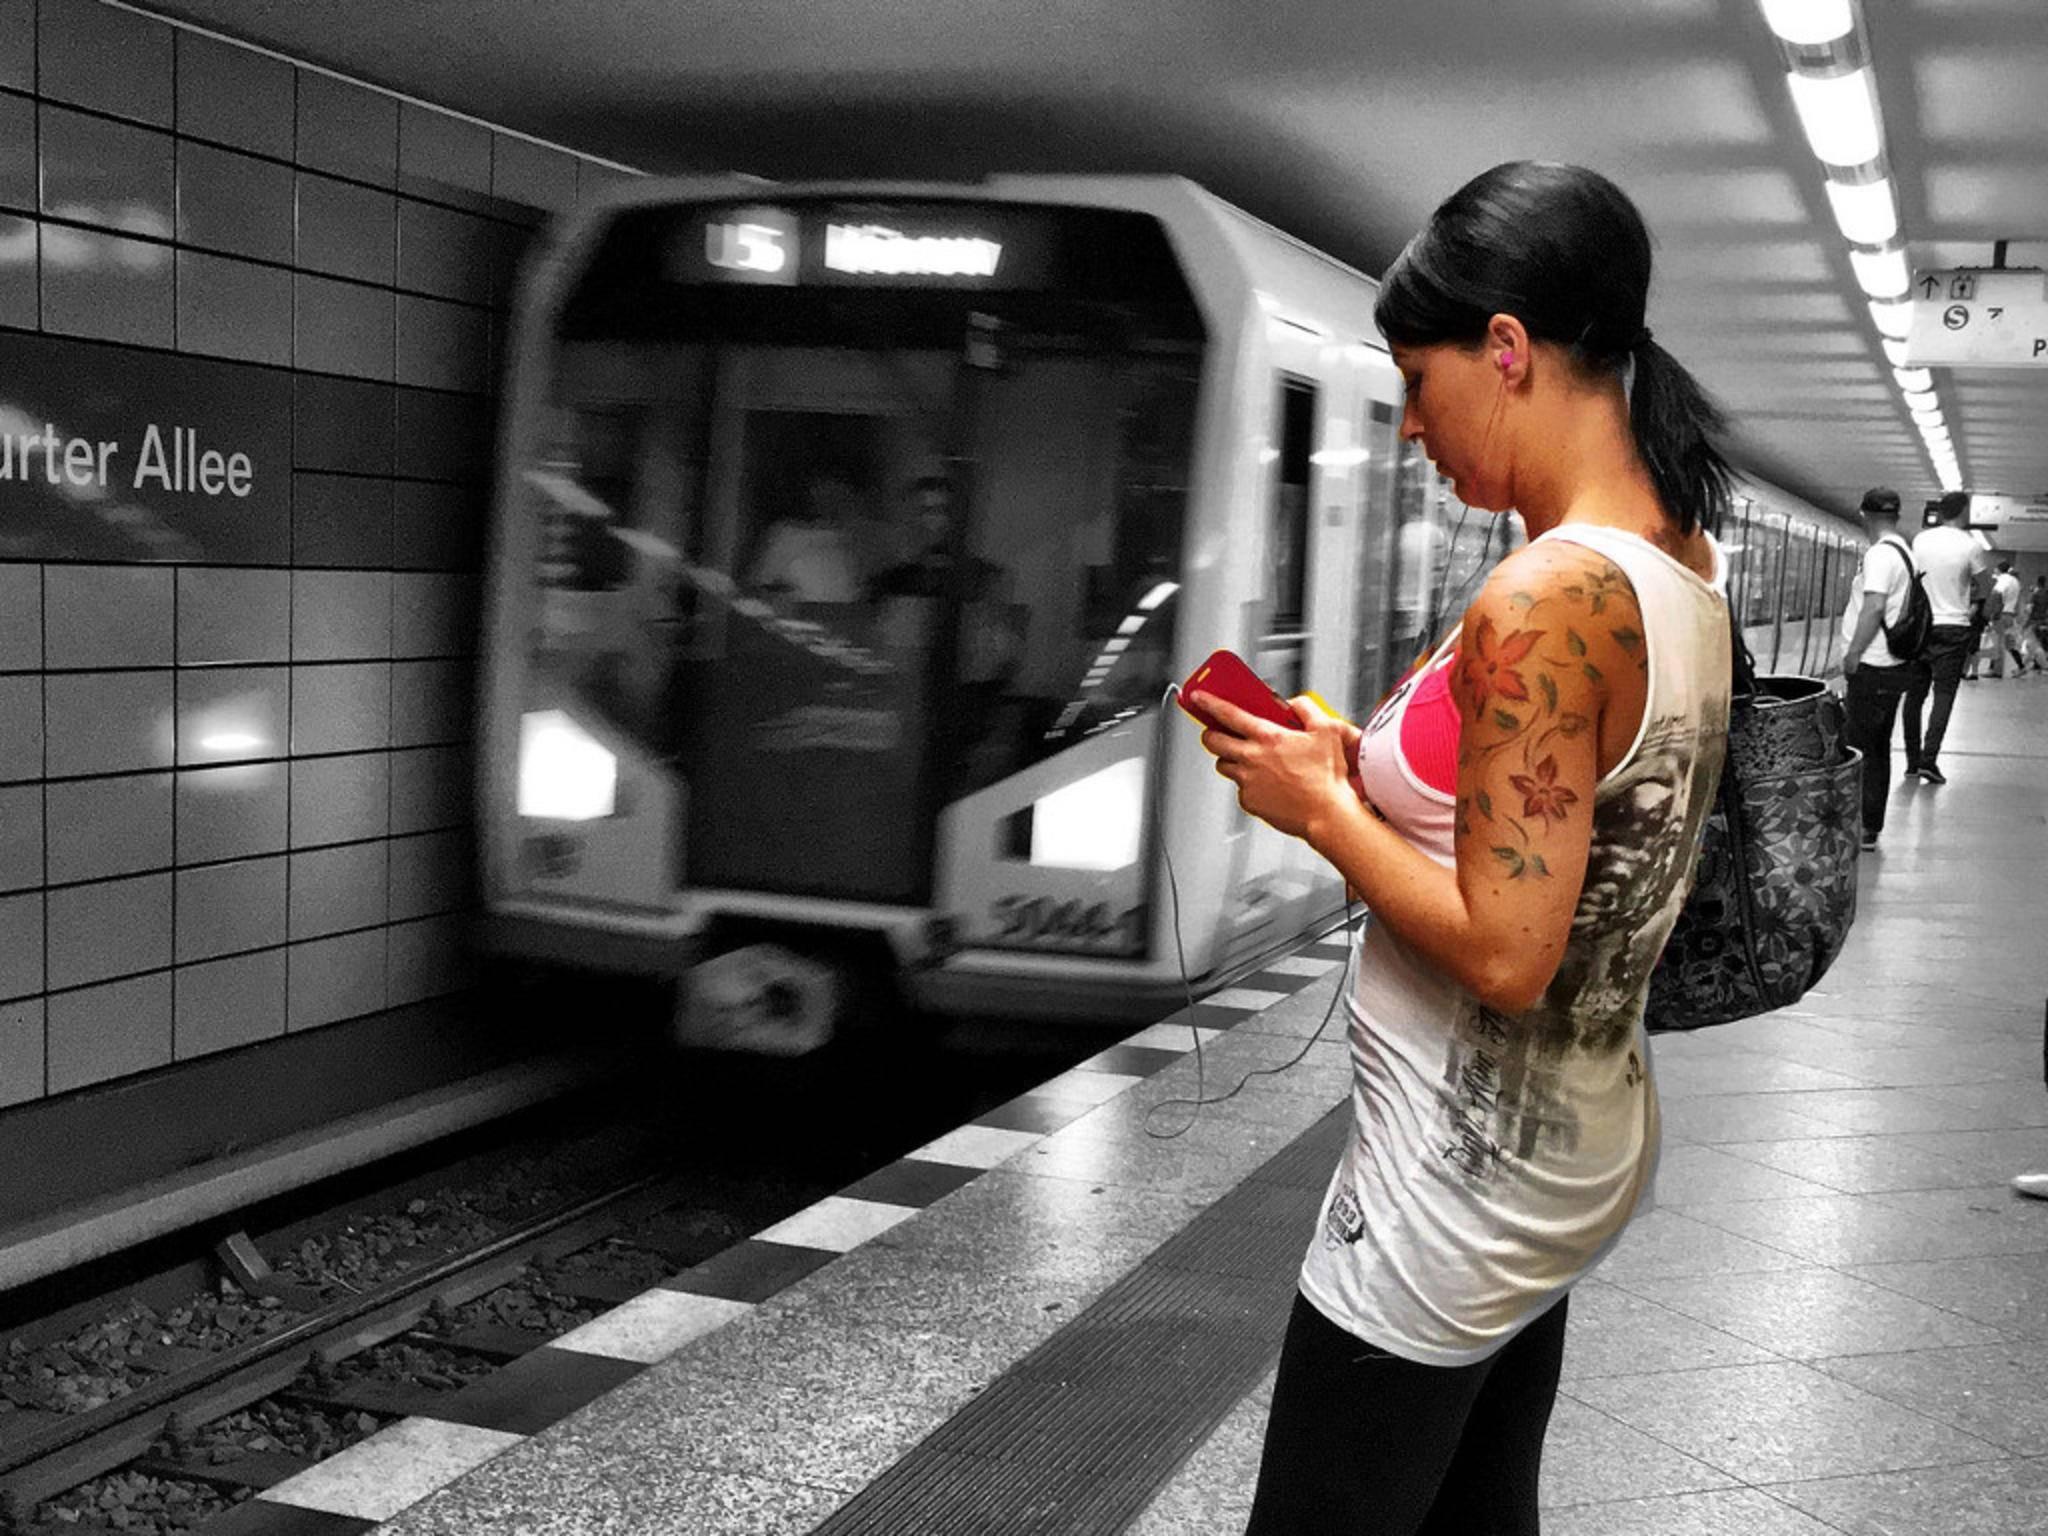 Hilft Tattoo-Erkennung bei der Verbrechensbekämpfung?